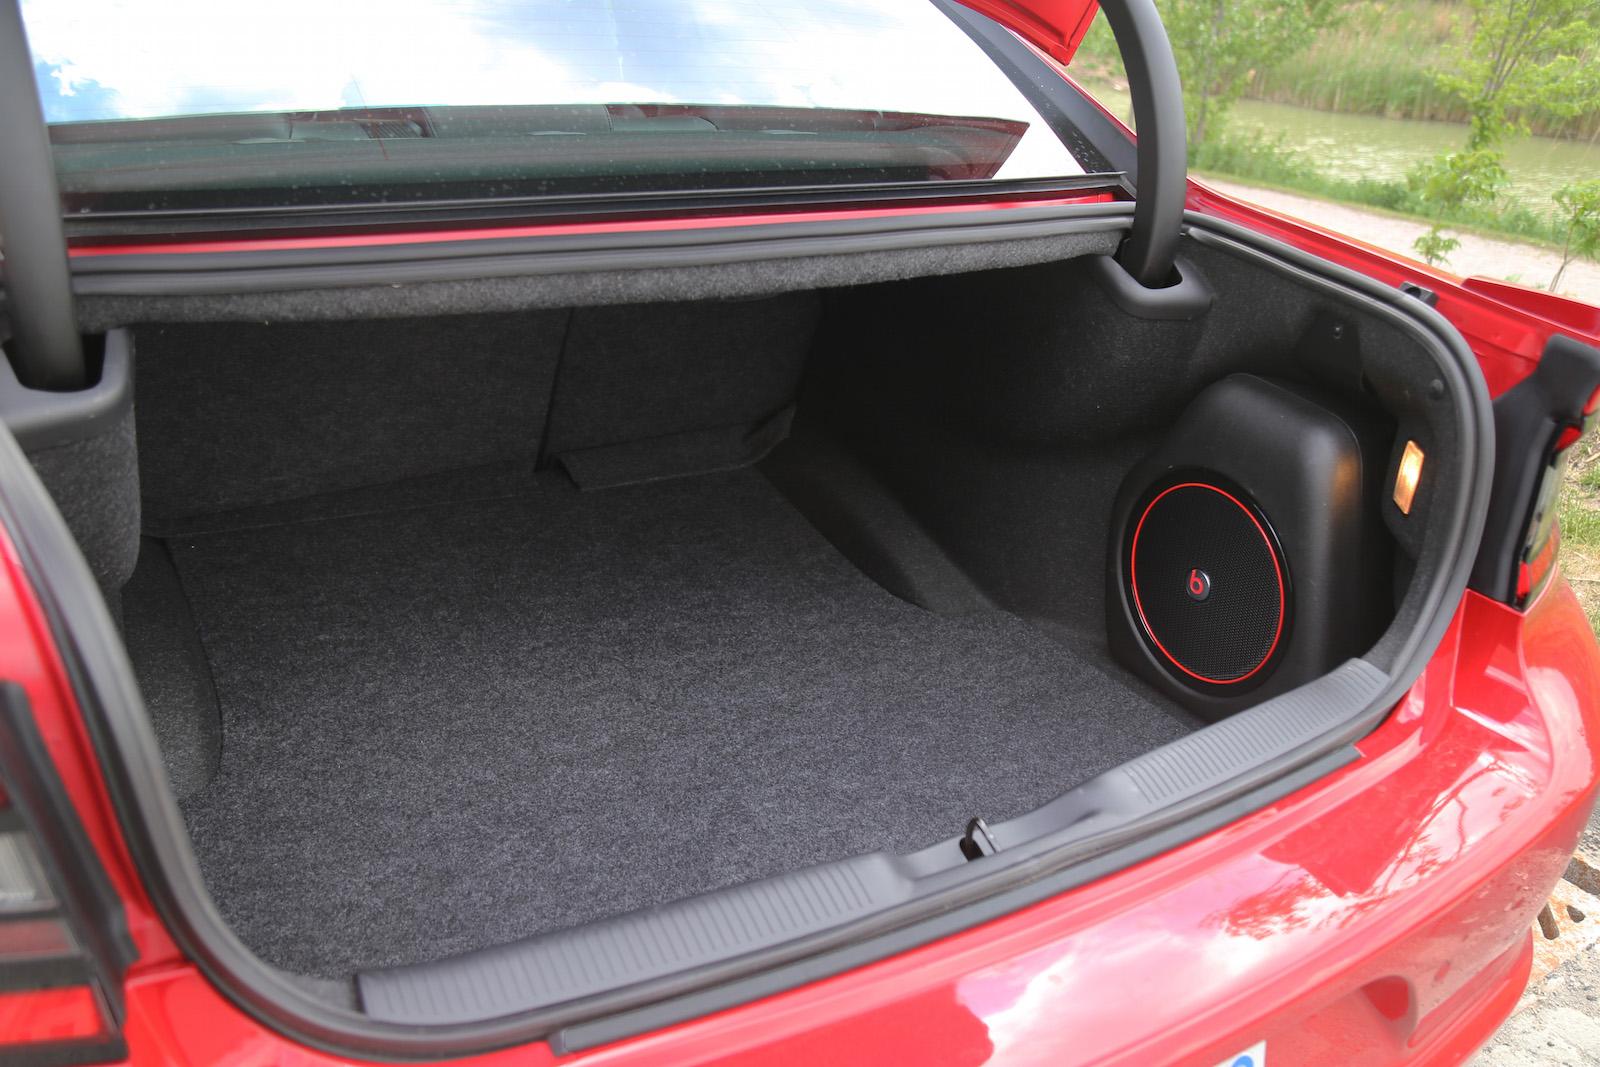 Dodge Charger Sxt Rallye >> ChineseAutoReview 車輪薦之 2015 道濟 Charger SXT 試車報告